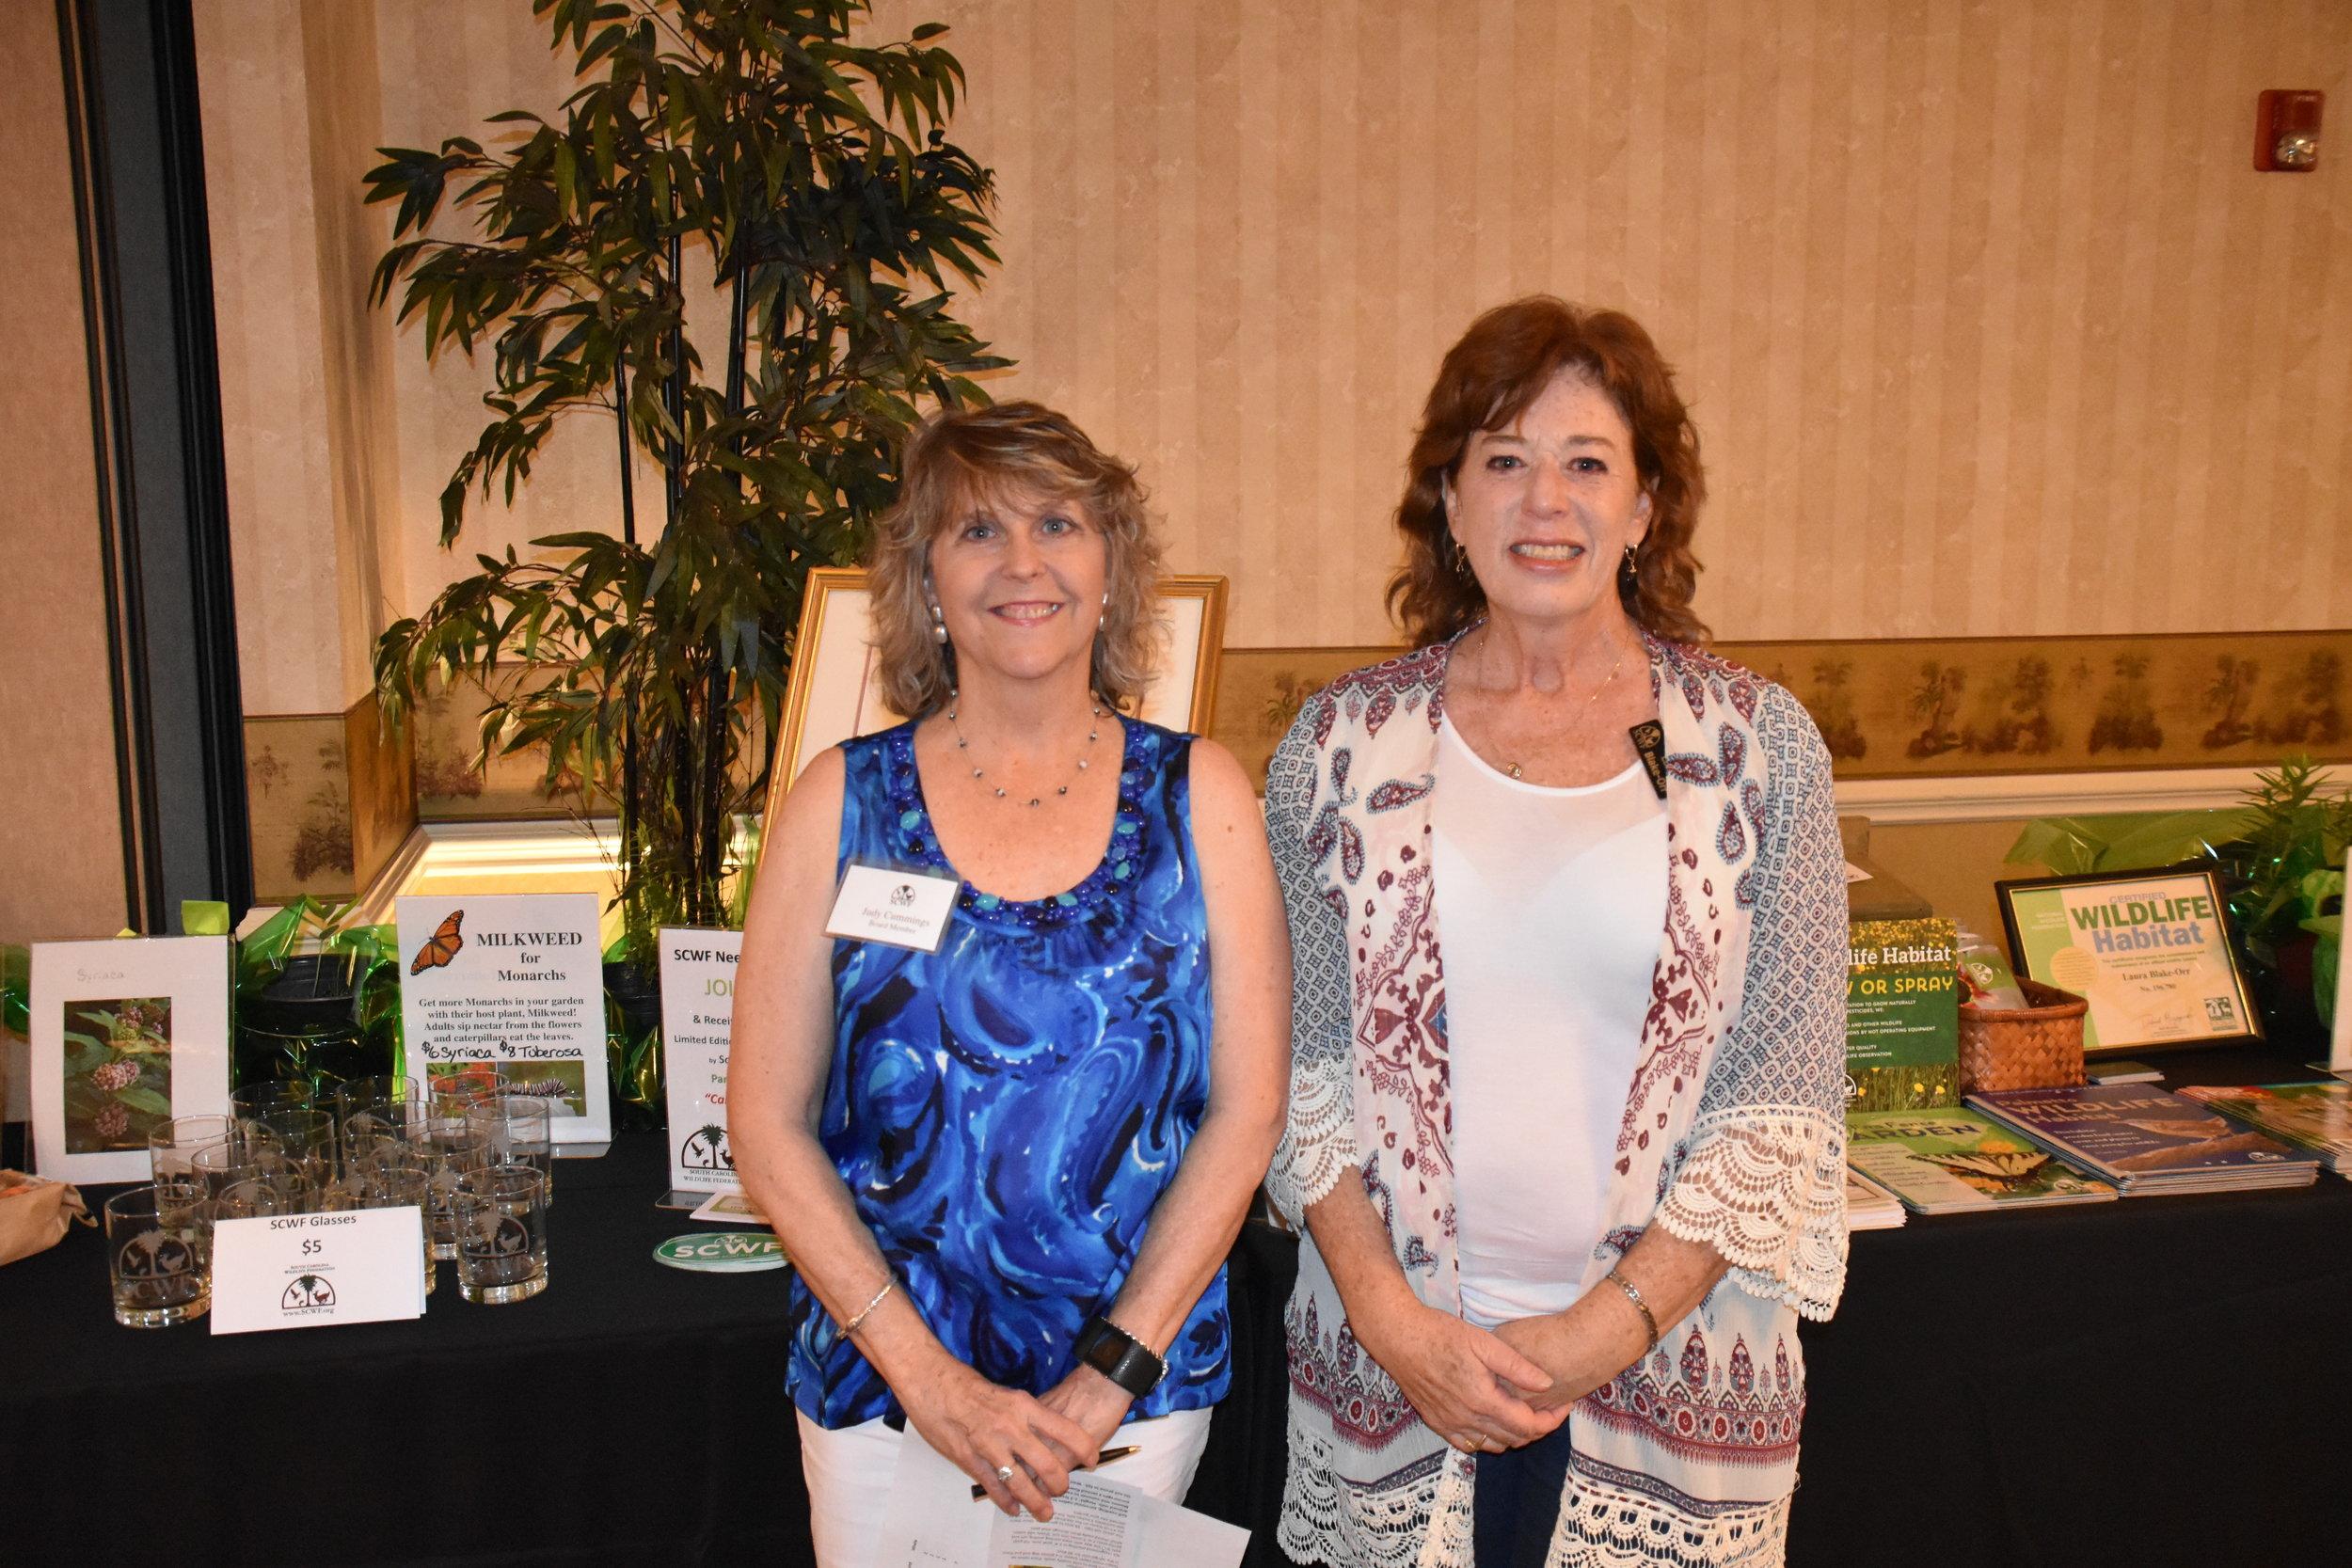 Volunteer Judy Cummings and Wildlife Habitat Manager Laura Blake-Orr. Photo credit: Ray Nelson